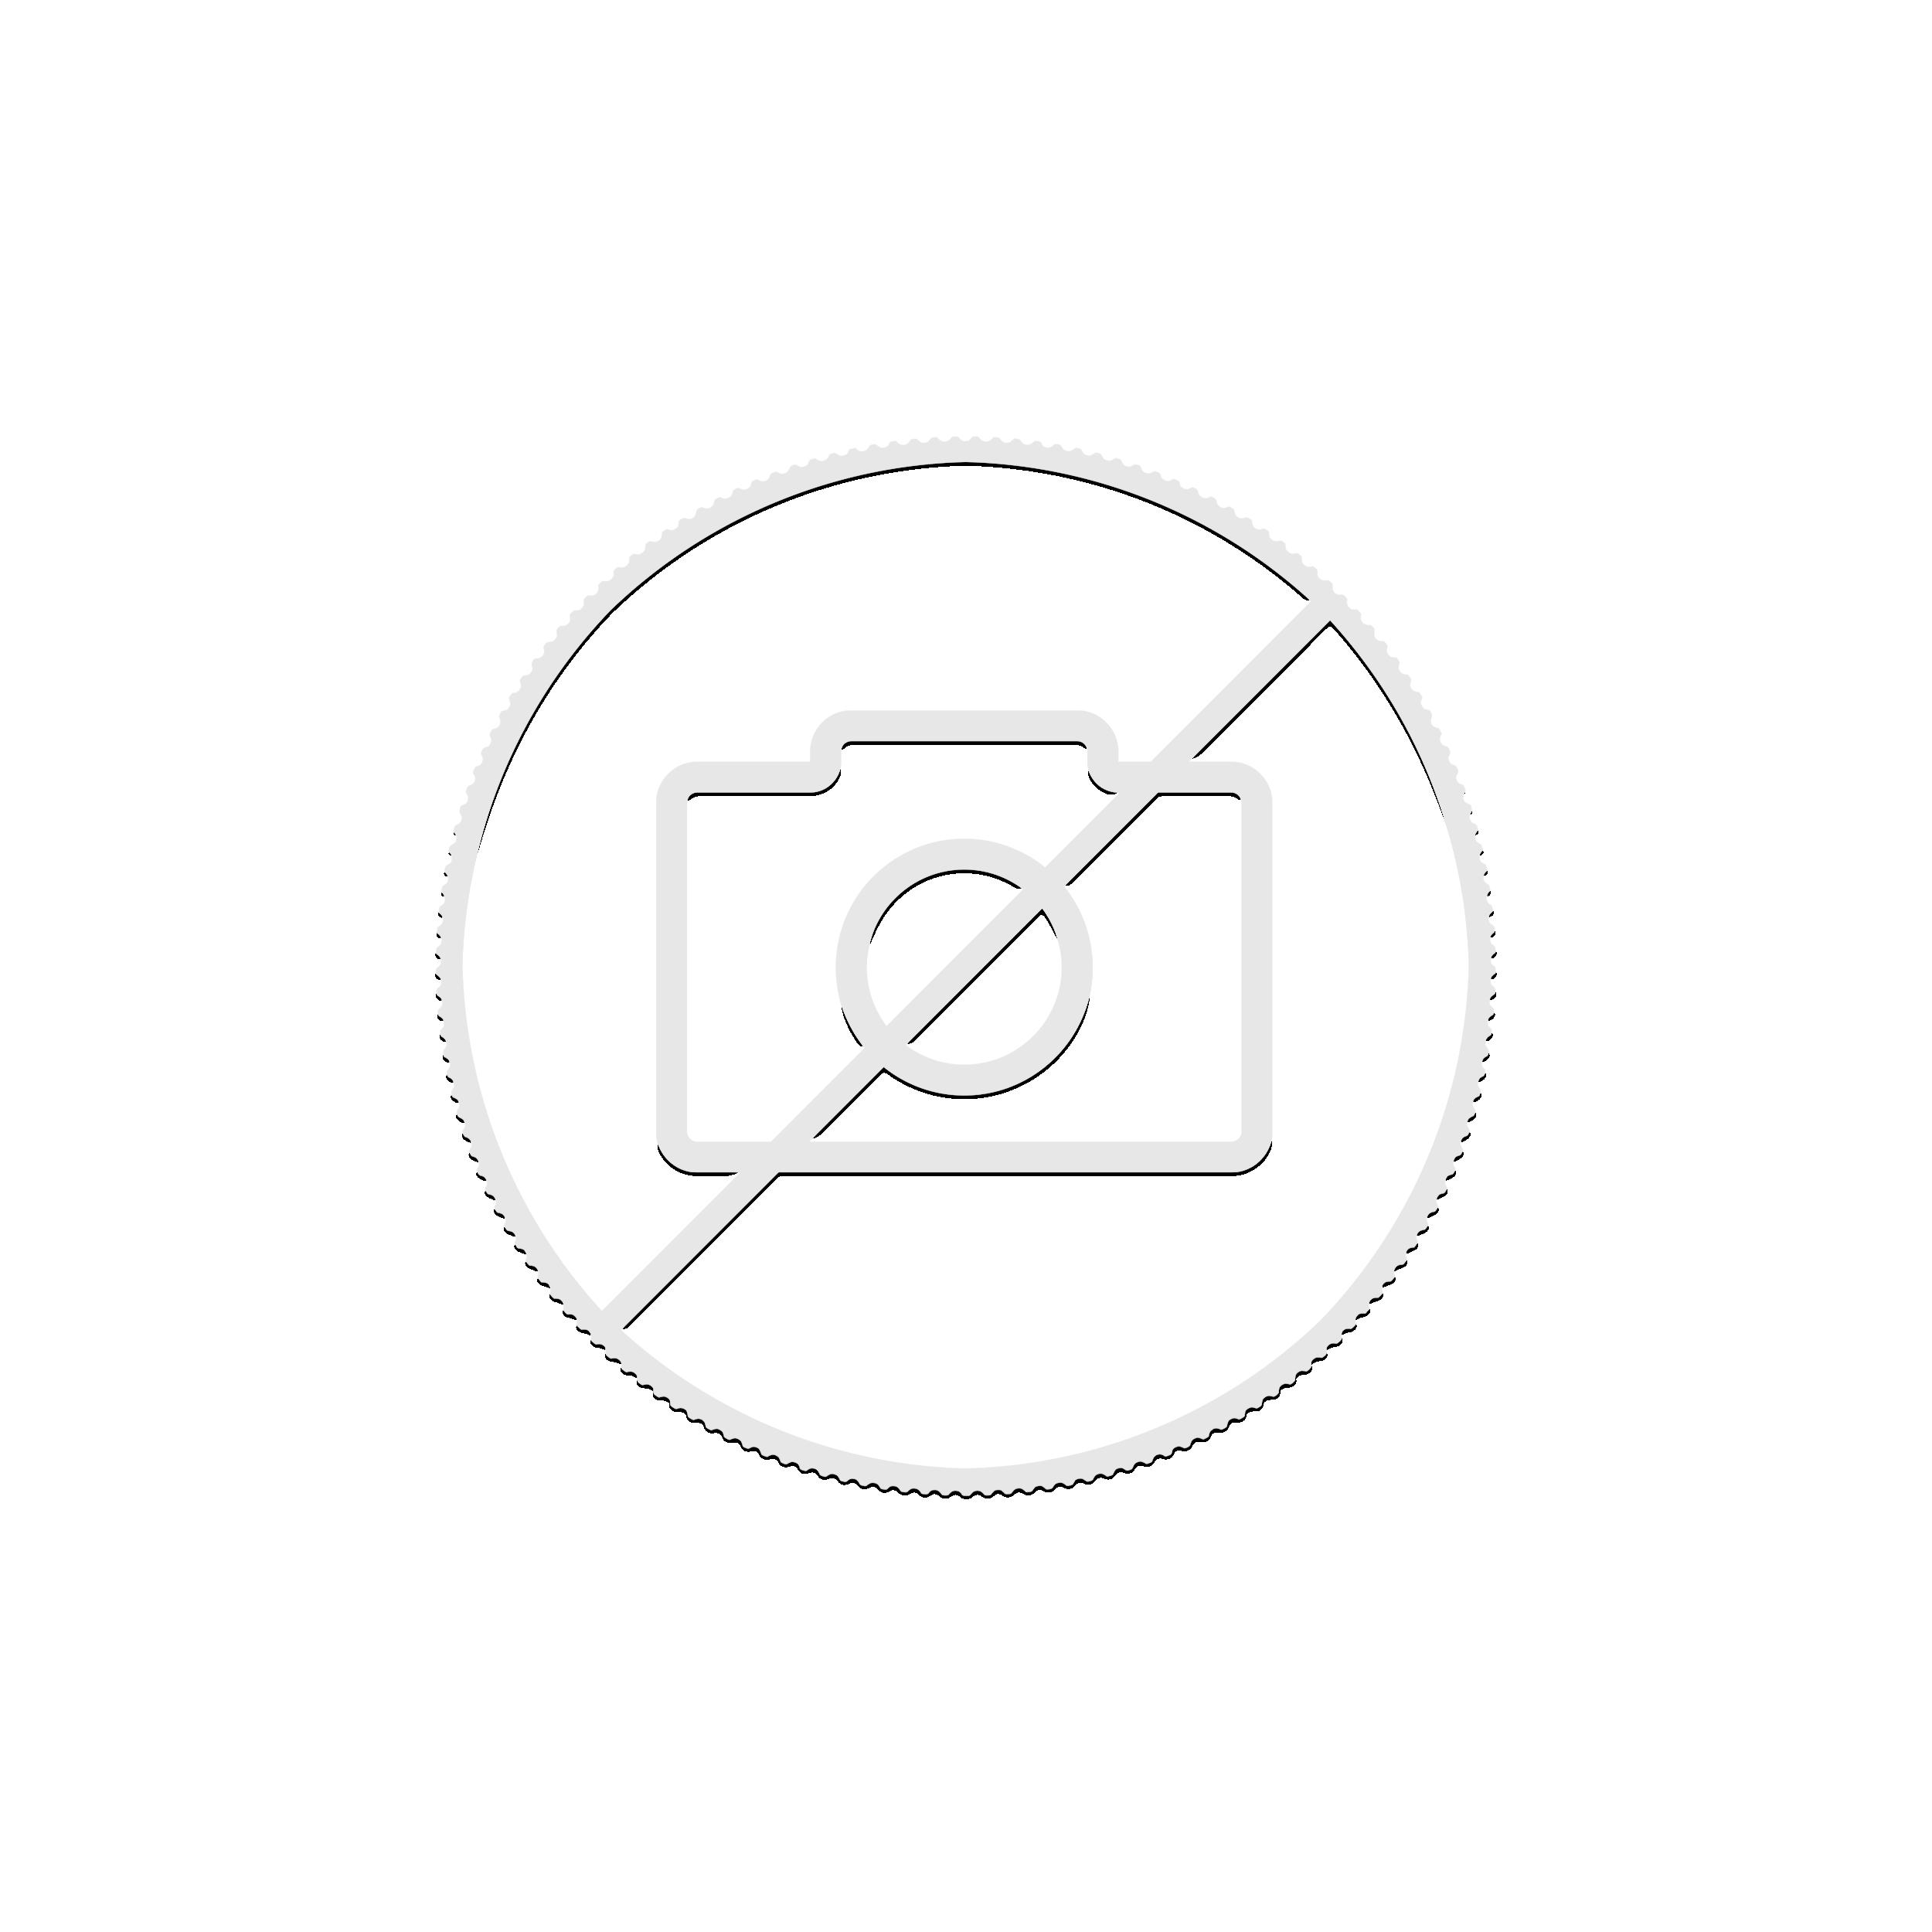 1 troy ounce zilveren munt Mystic Wolf 2021 Proof